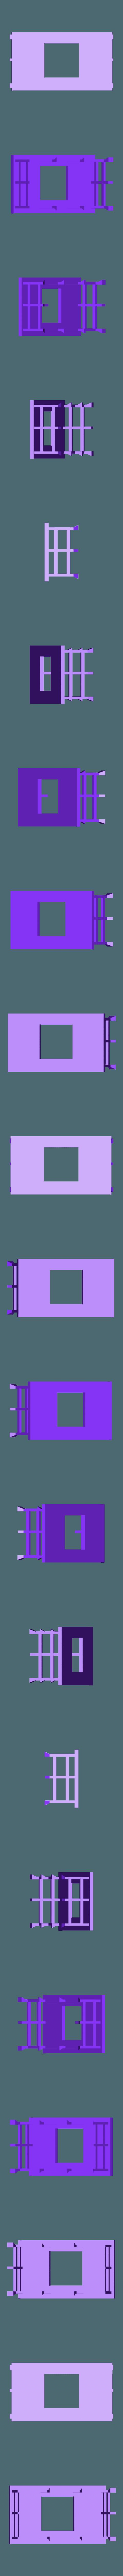 Plancher de la plateforme25x43.STL Download STL file SNCF lighting pylon • 3D printable object, dede34500